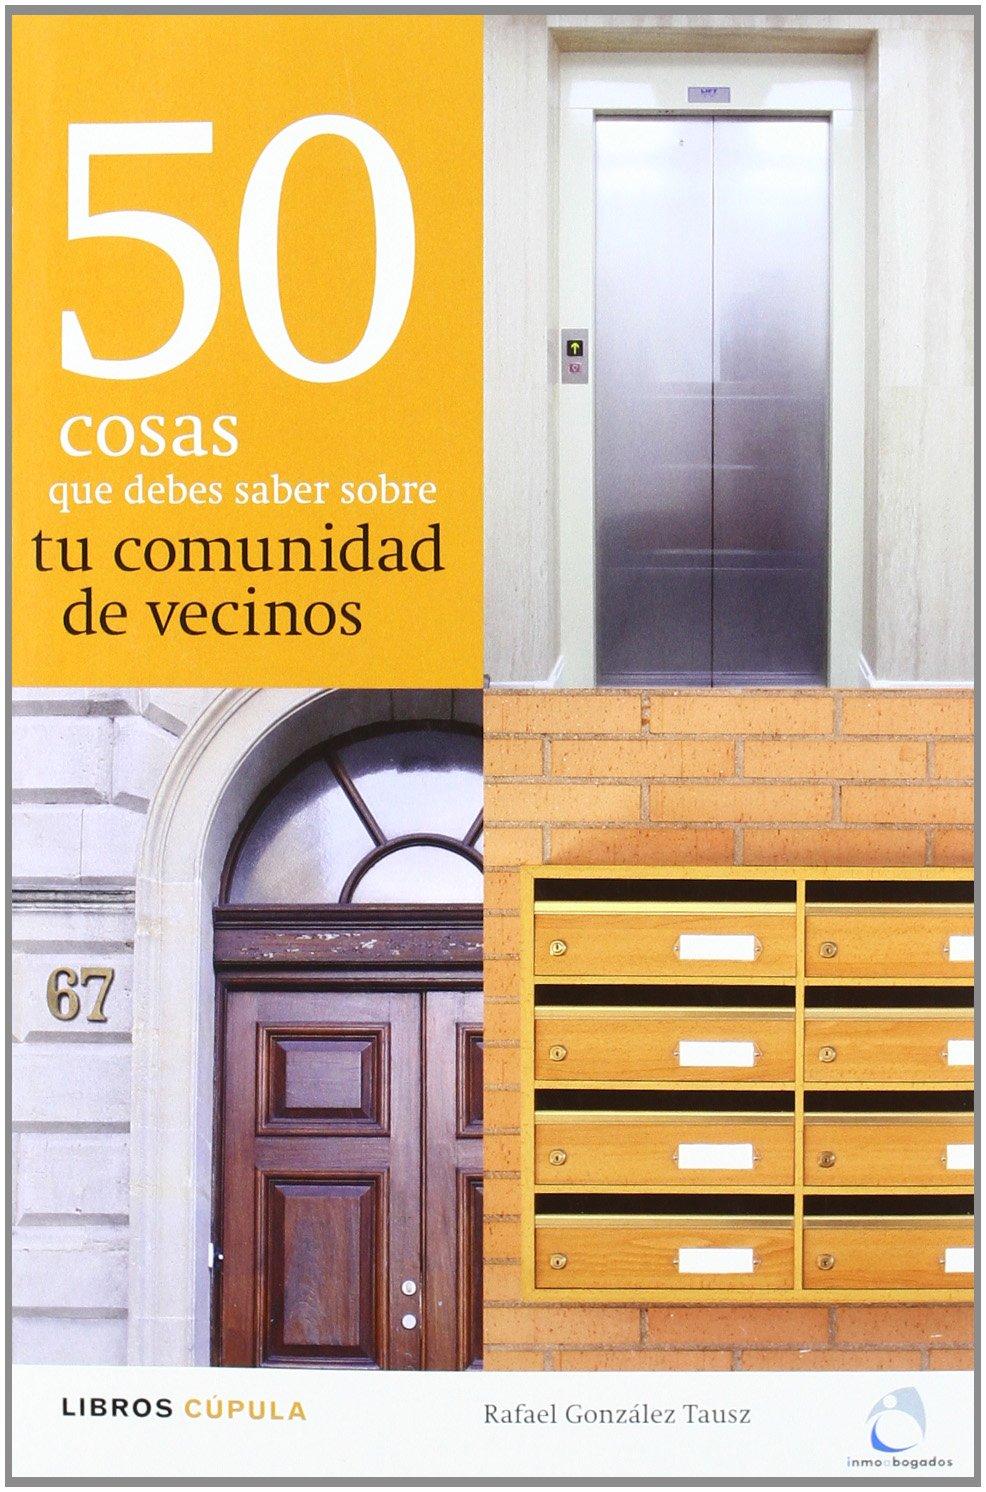 50 cosas que debes saber sobre tu comunidad de vecinos Tapa blanda – 21 feb 2012 Rafael González Tausz Libros Cúpula 8448000463 JP210564